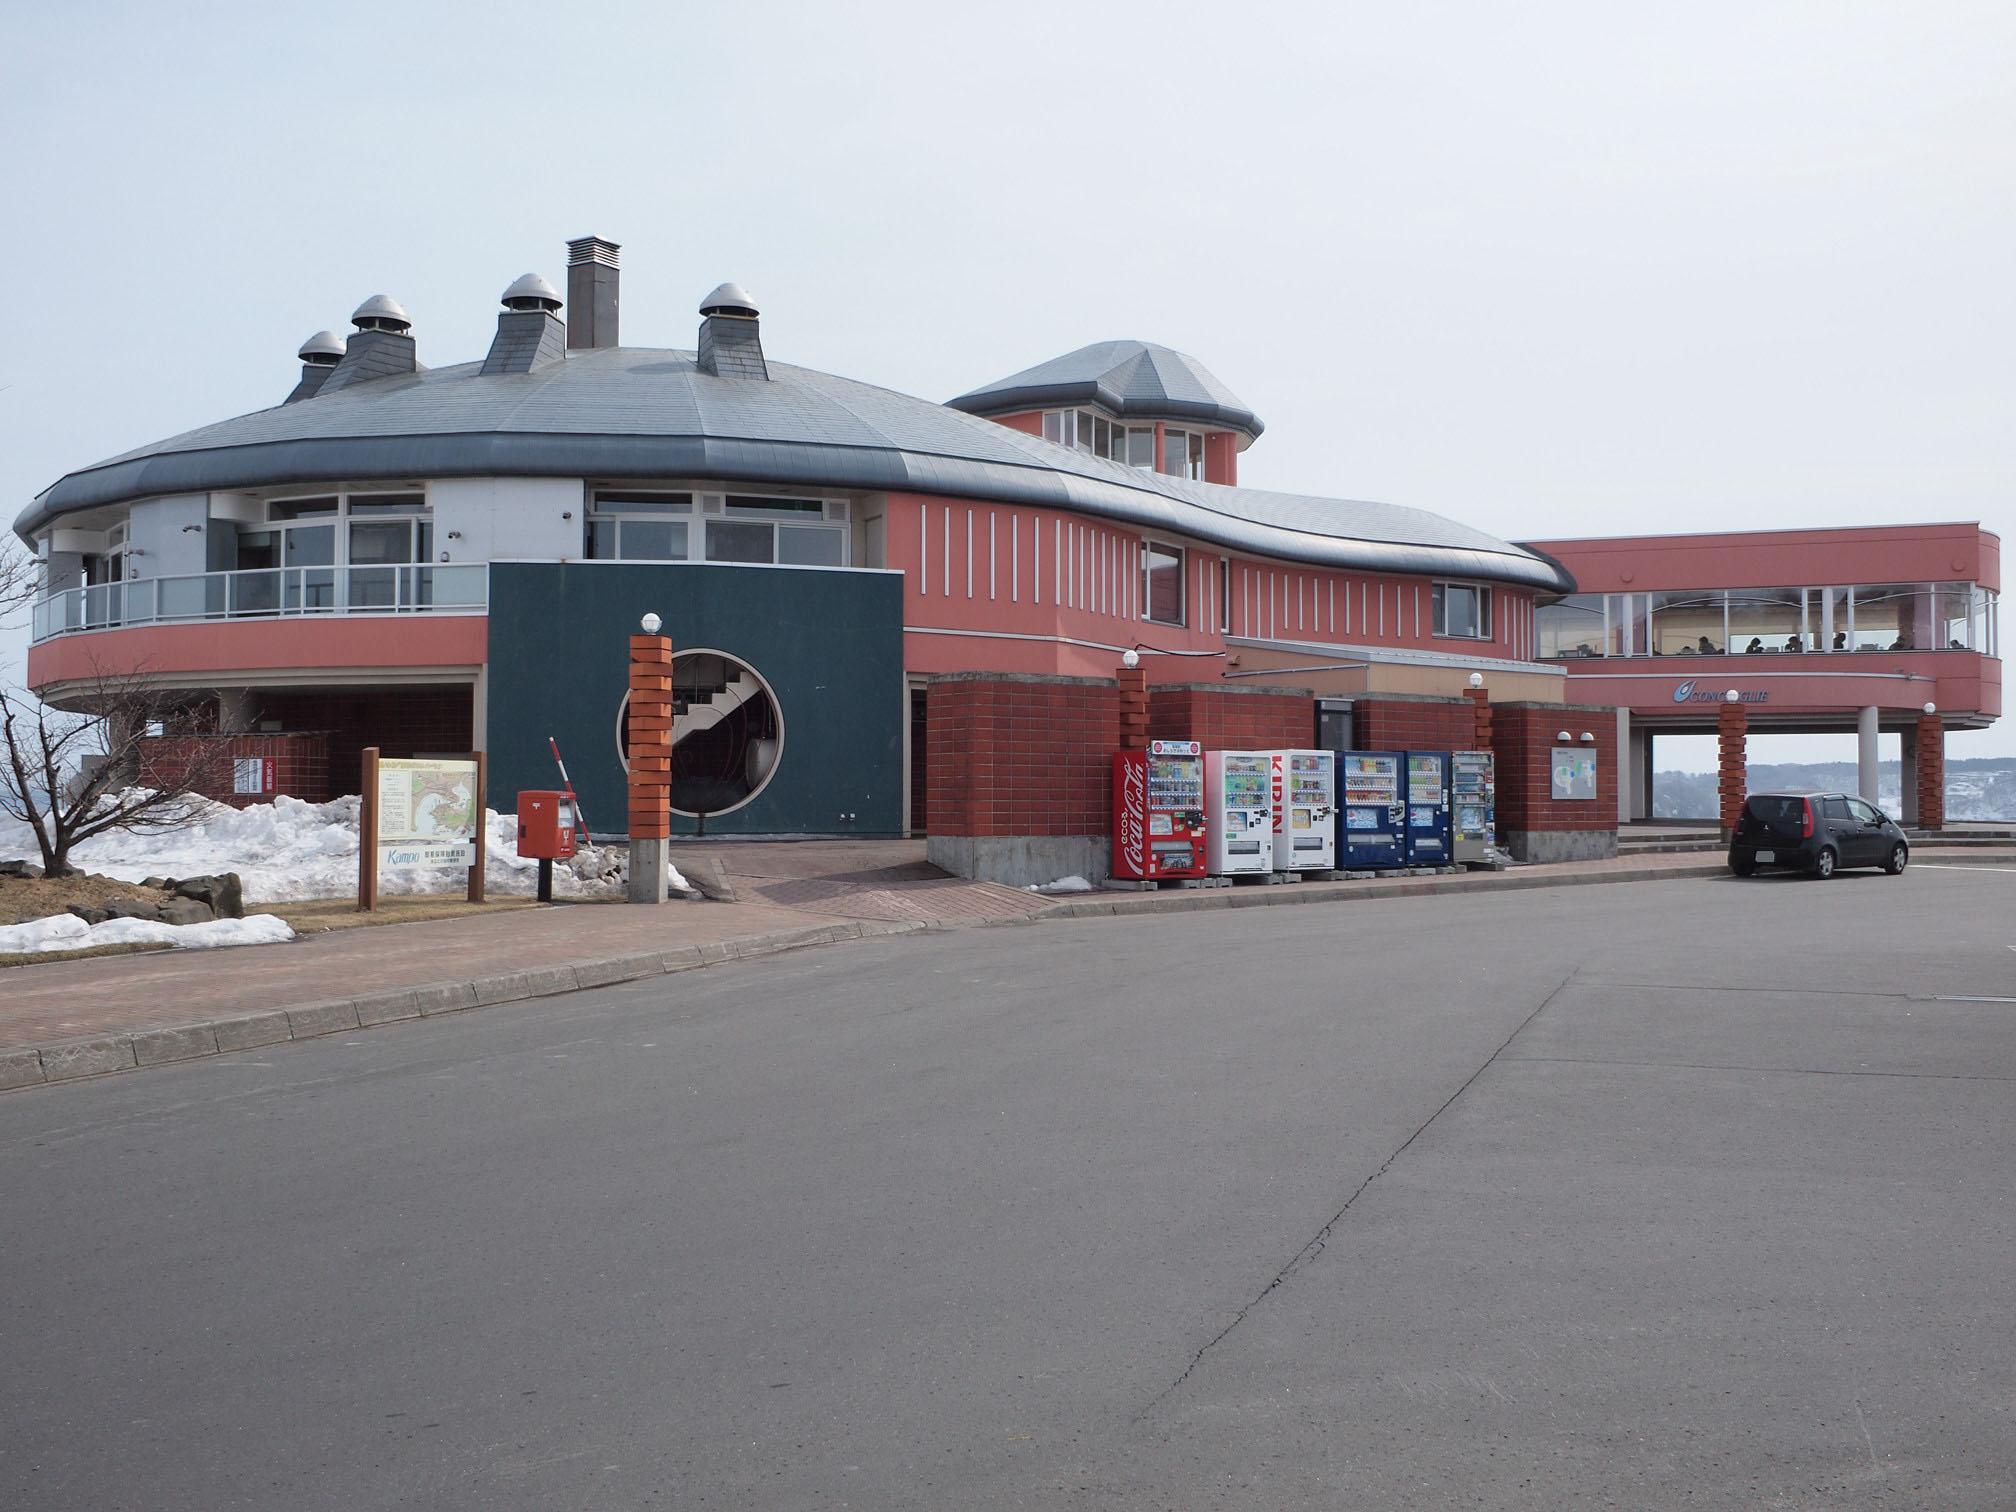 https://upload.wikimedia.org/wikipedia/commons/5/5b/Roadside_Station_Akkeshi_Gourmet_Park.jpg